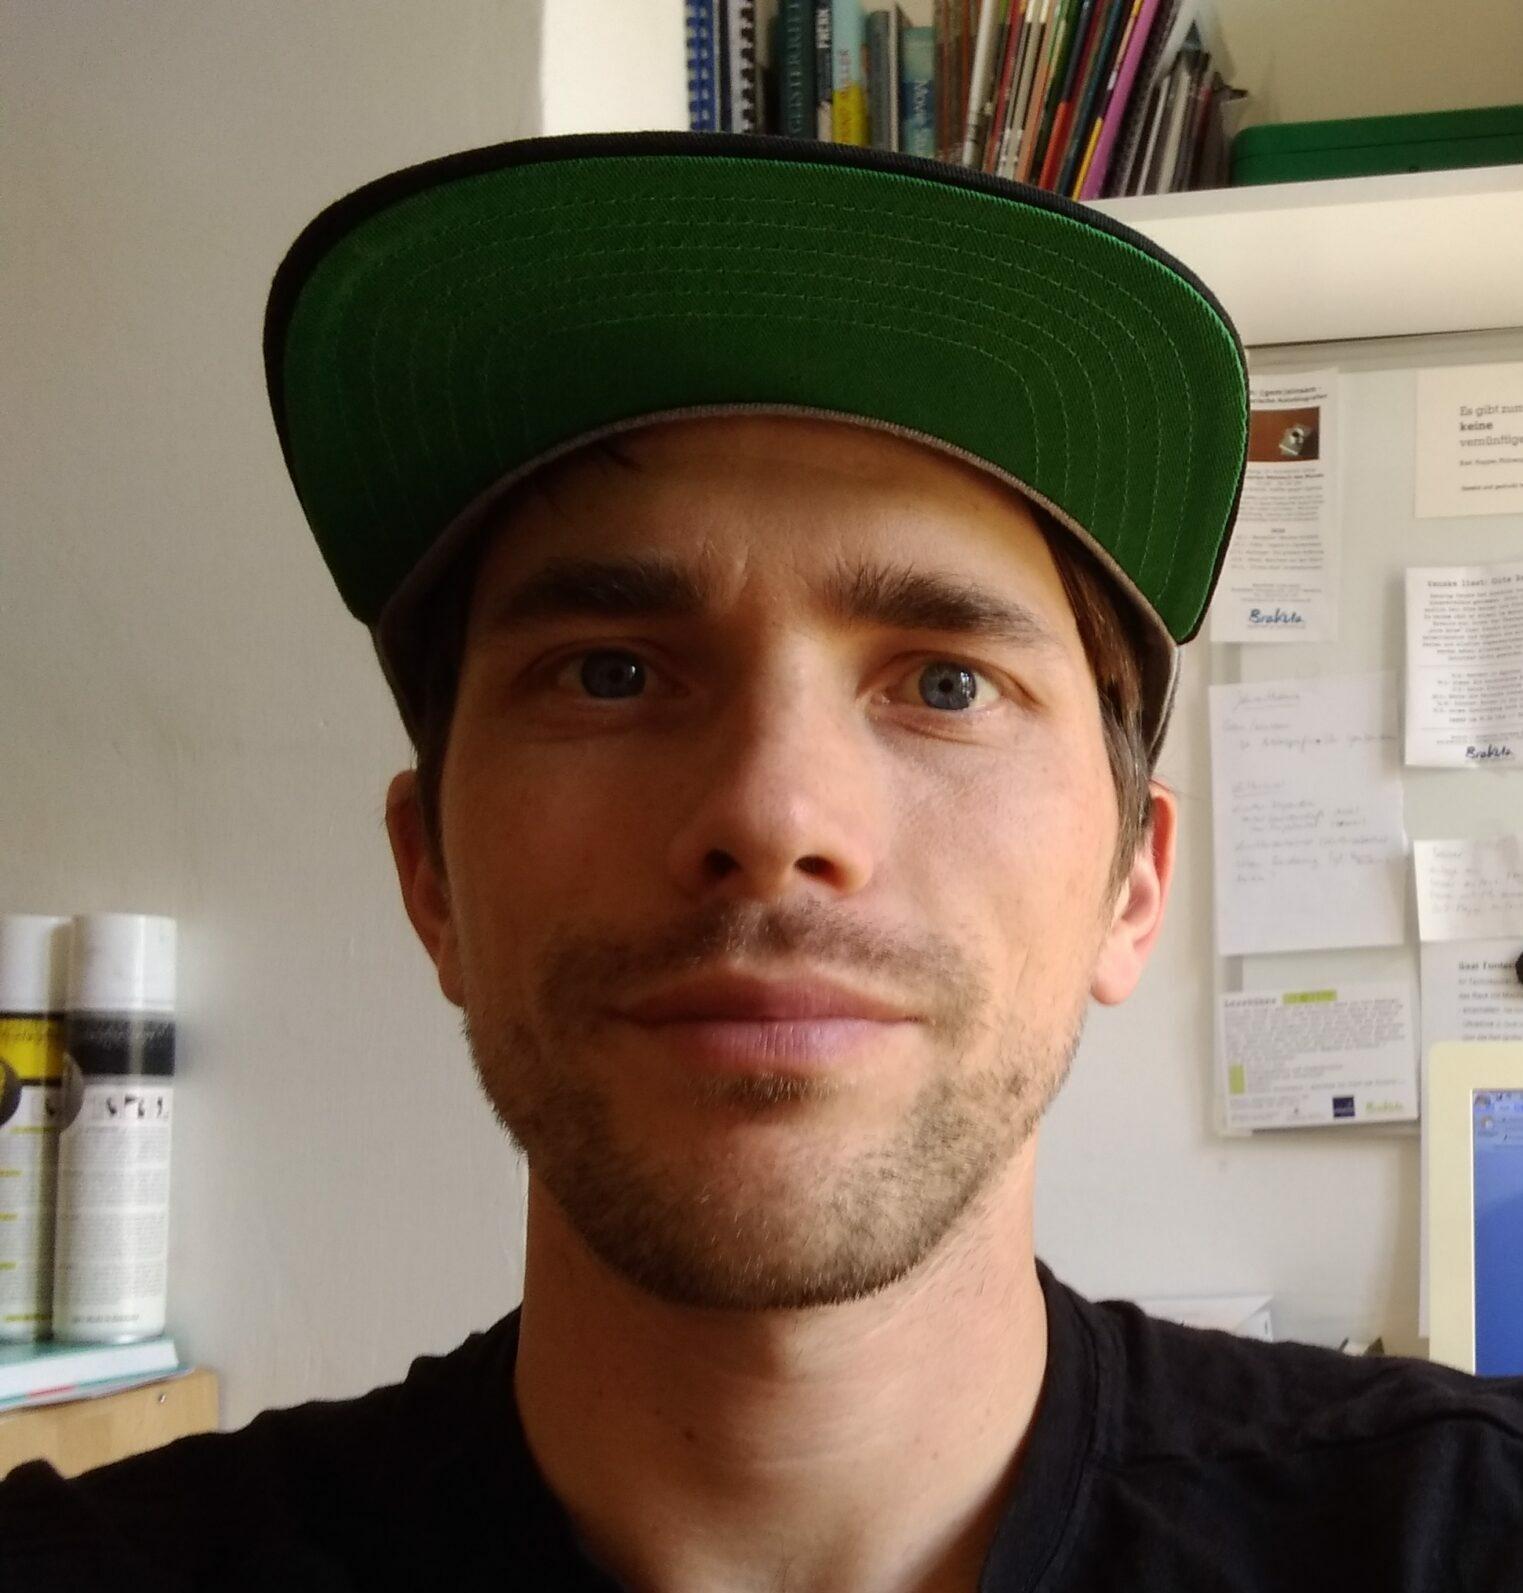 Konstantin Ulmer